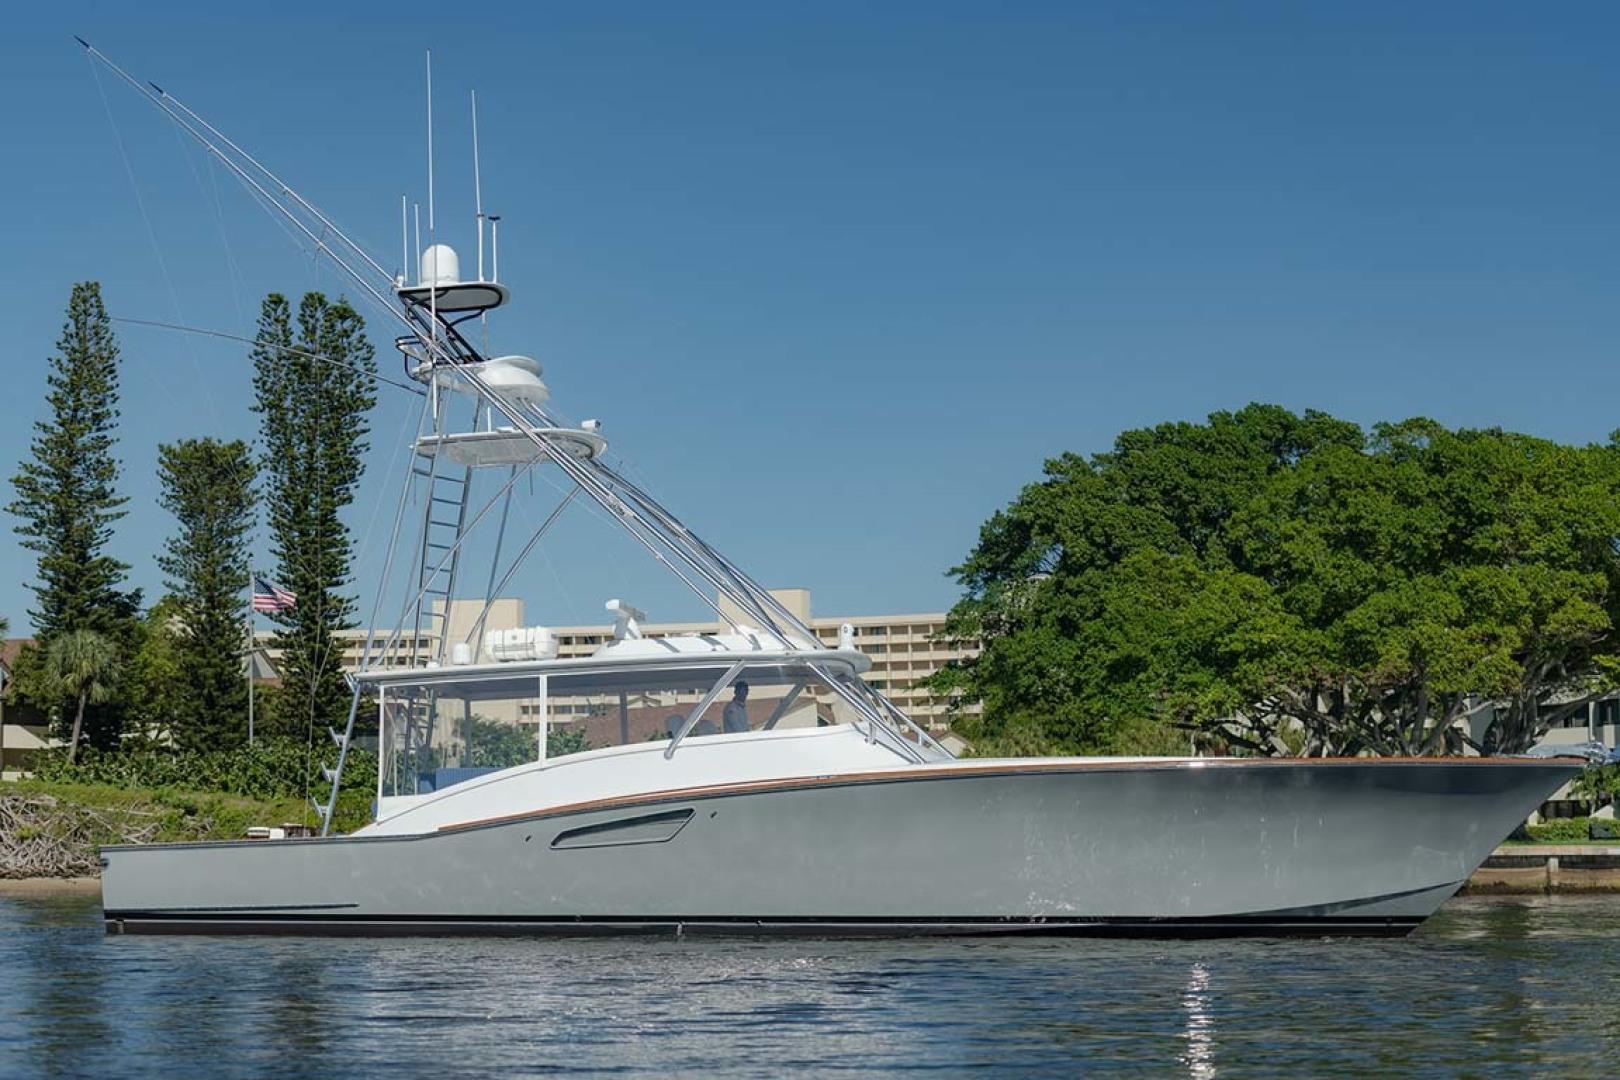 Jim Smith-Walkaround Express 2018-Eurybia North Palm Beach-Florida-United States-Starboard View-1573706   Thumbnail